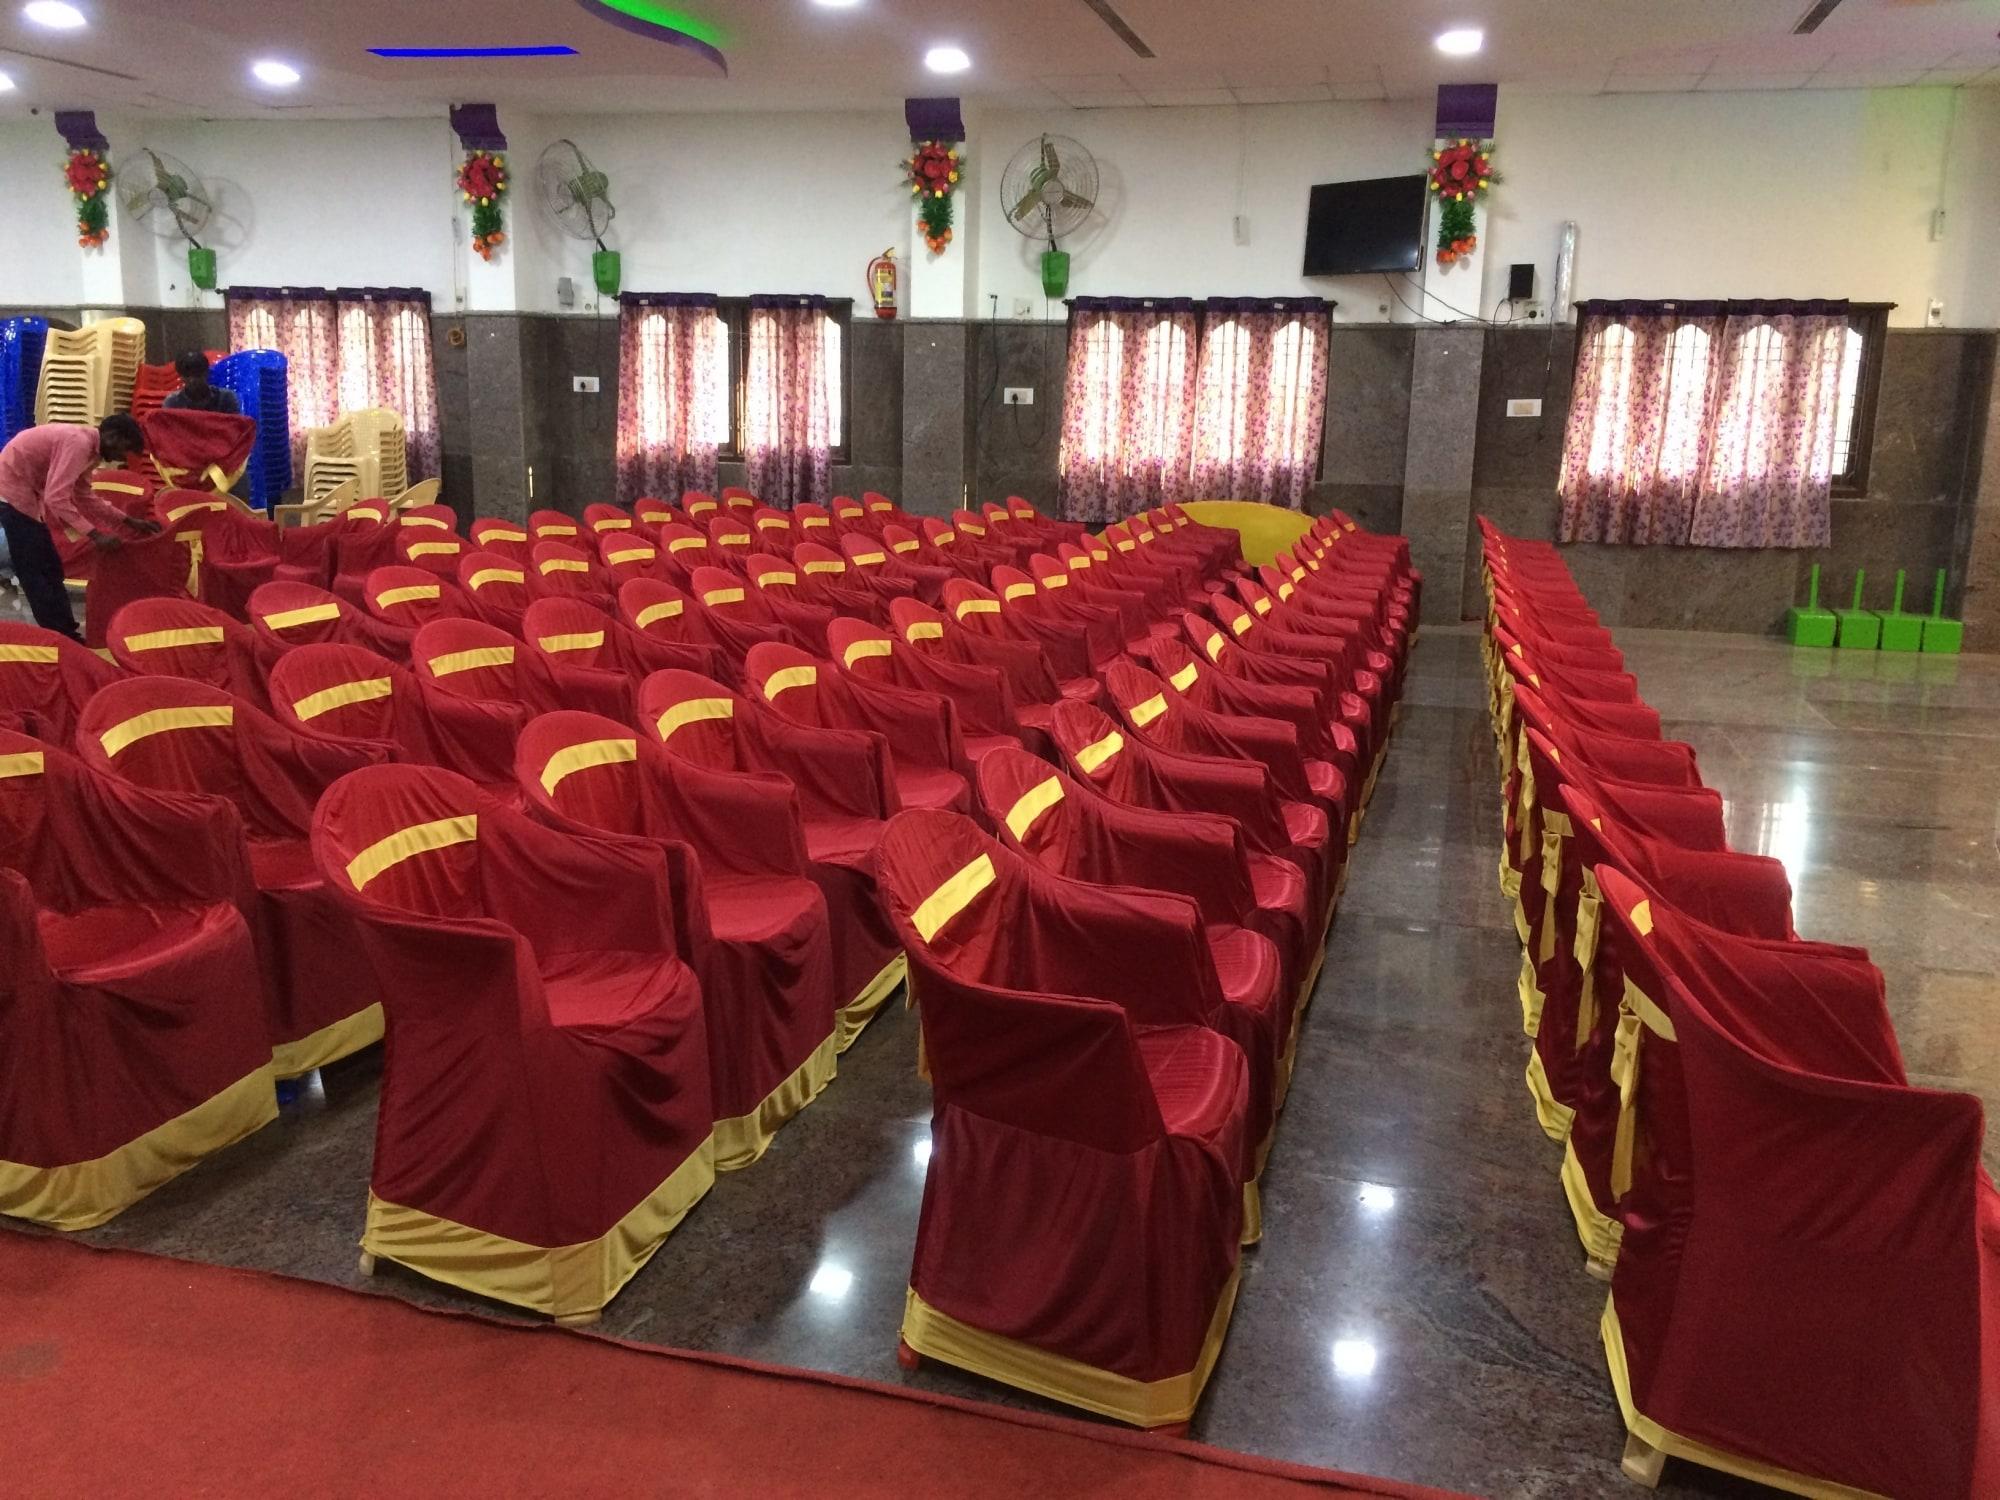 rani-mahal-ac-perungalathur-chennai-kalyana-mandapams-7wcaj Top marriage halls in Chromepet for a memorable wedding! Venues